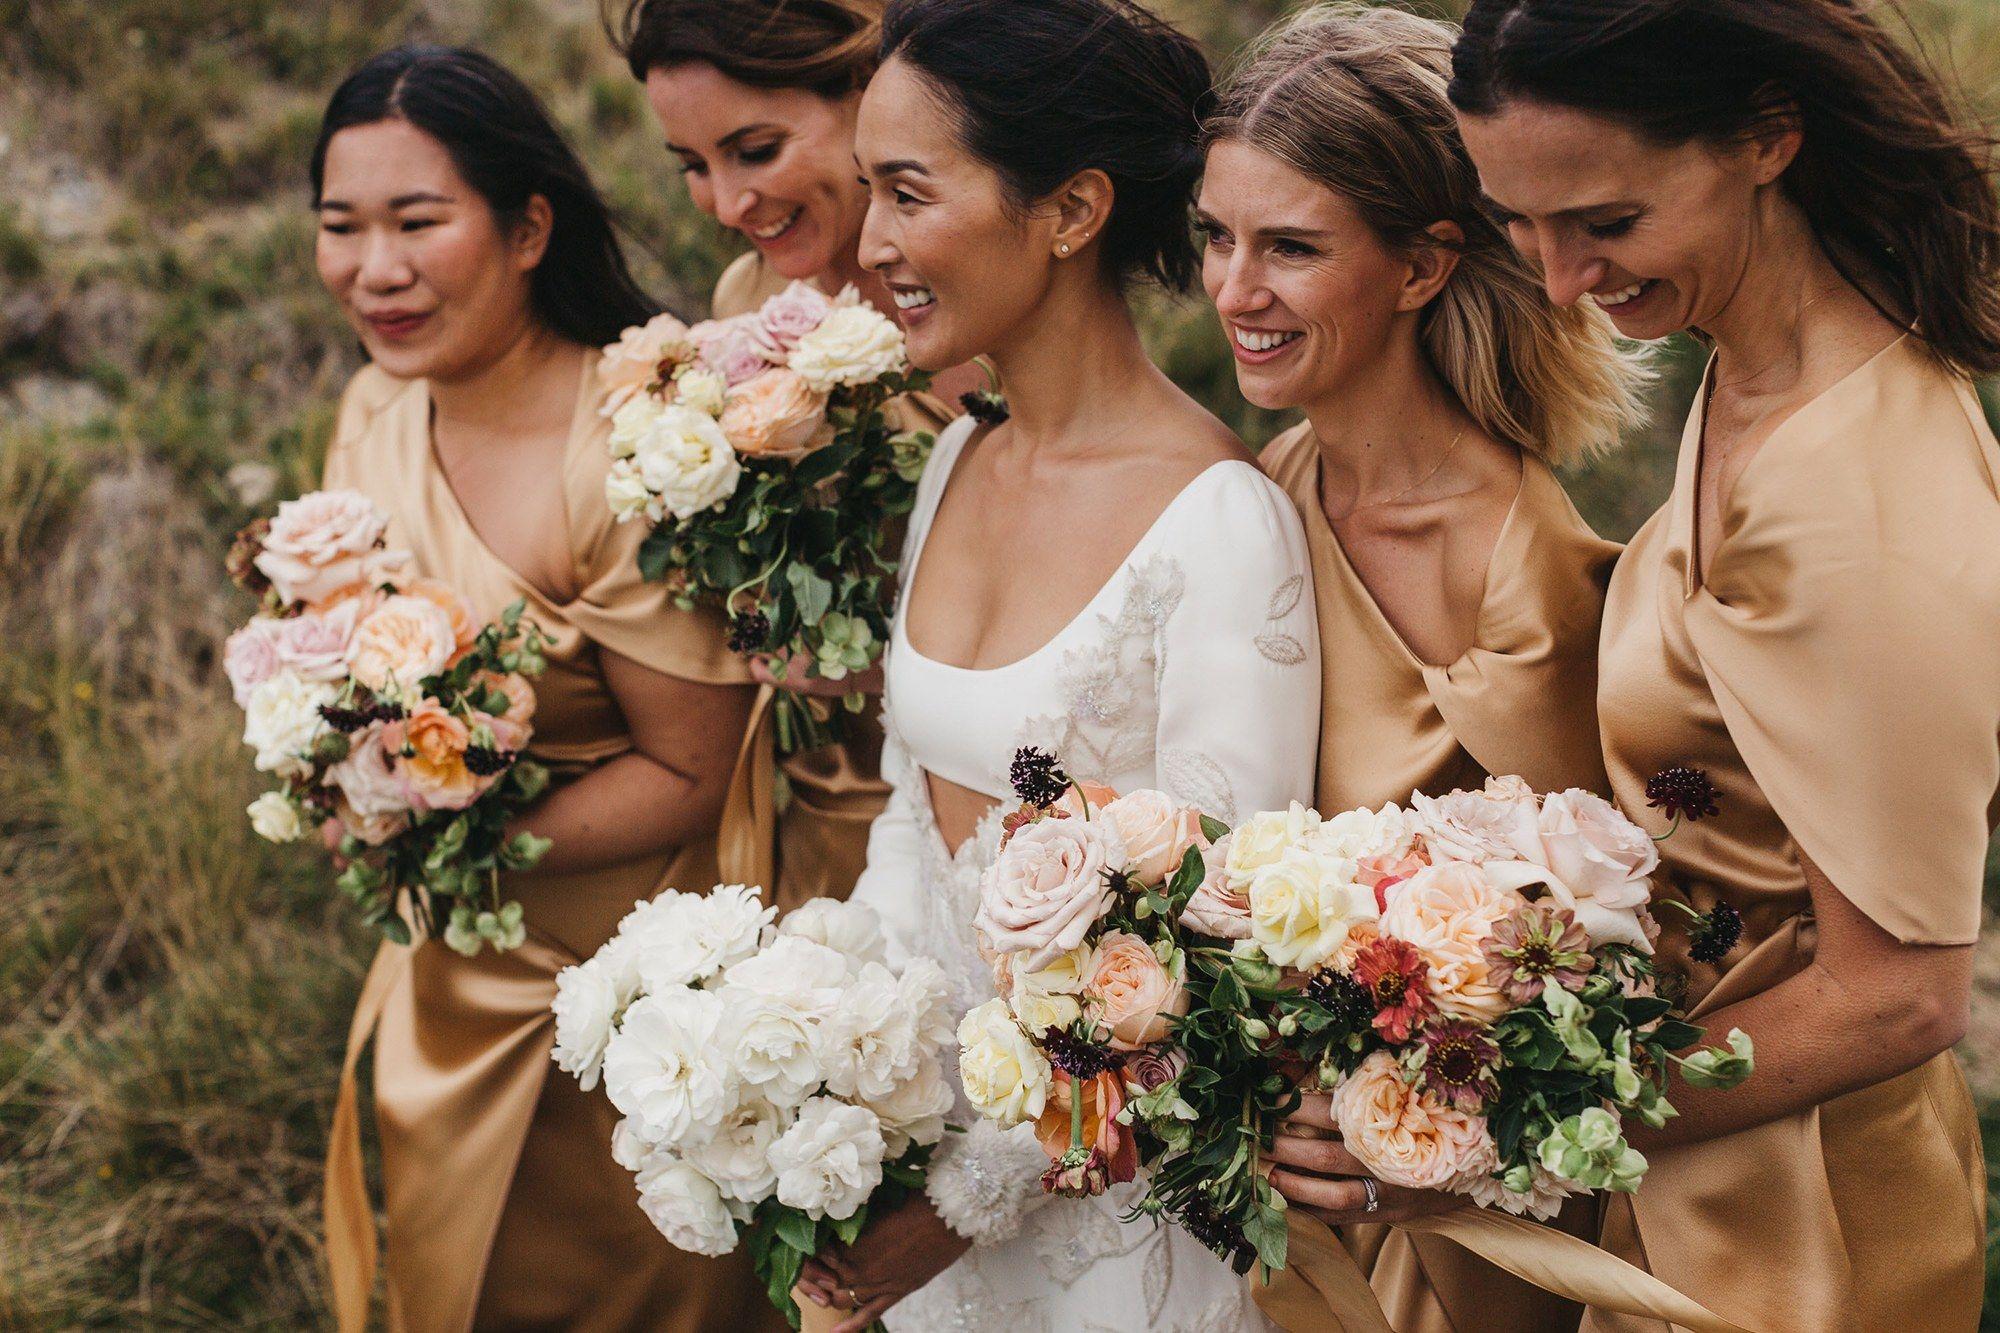 Nicole Warne of Gary Pepper Girl Had A Wild Garden Wedding